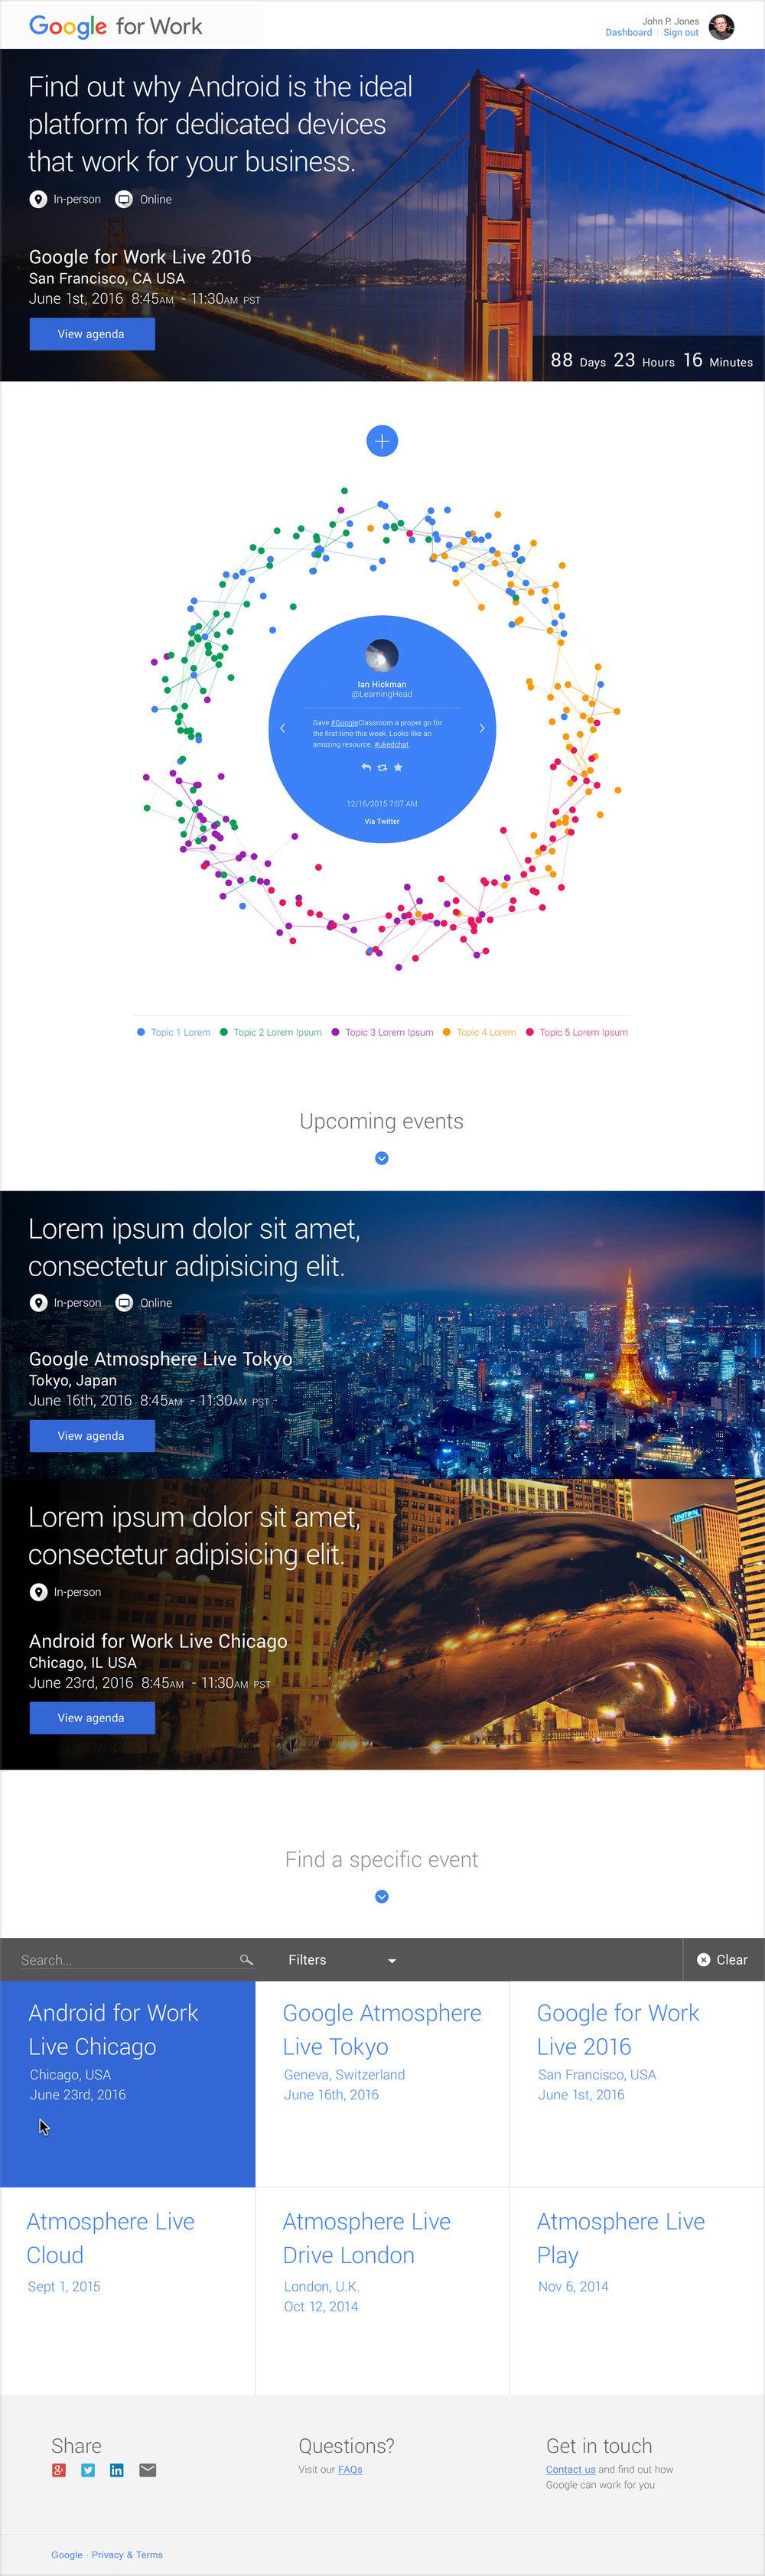 Google_ATMO_withGoogle_020116_1.jpg